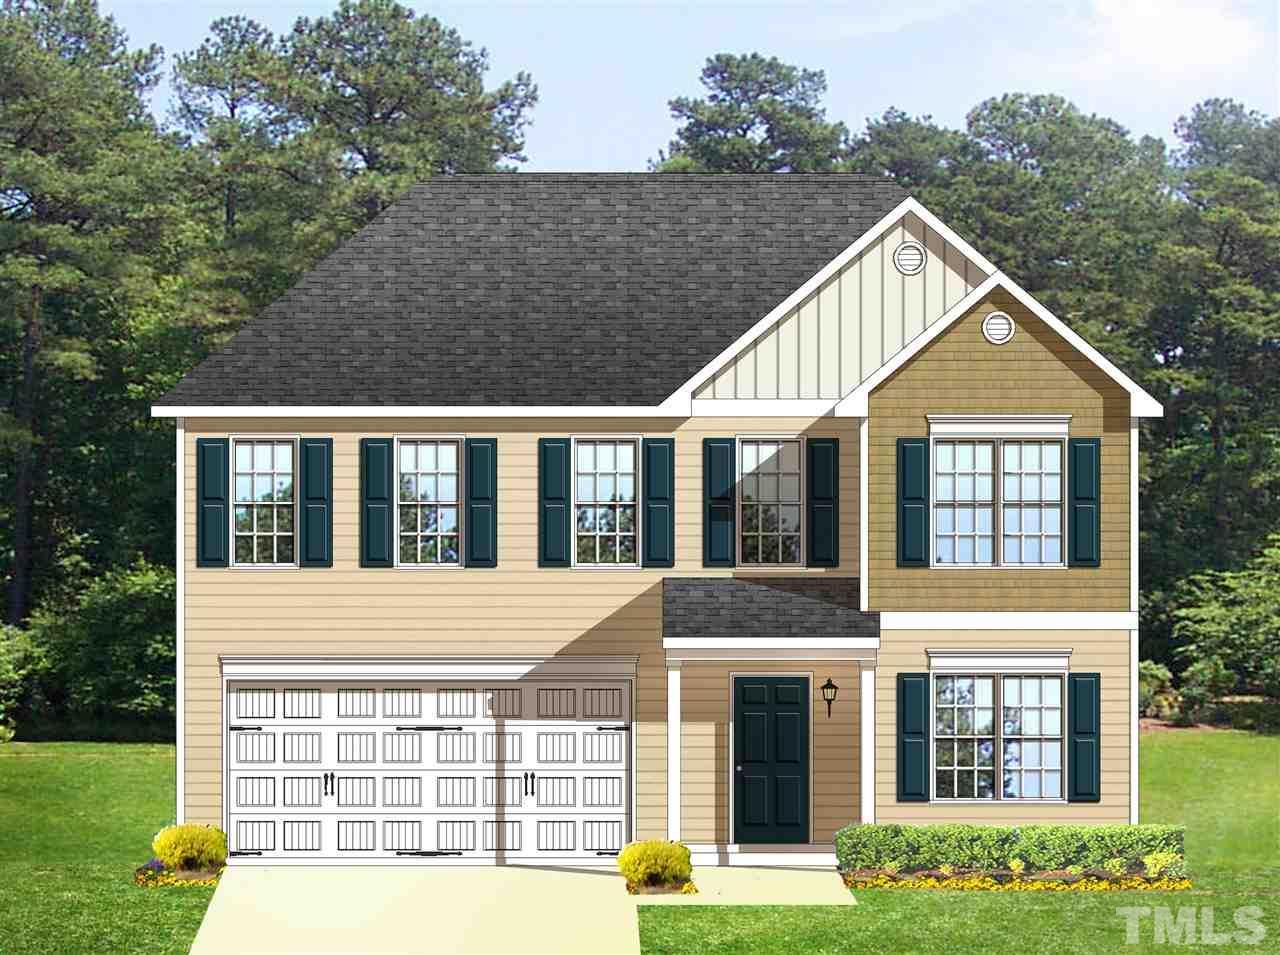 280 MEADOW HILLS Drive 15, Four Oaks, NC 27524